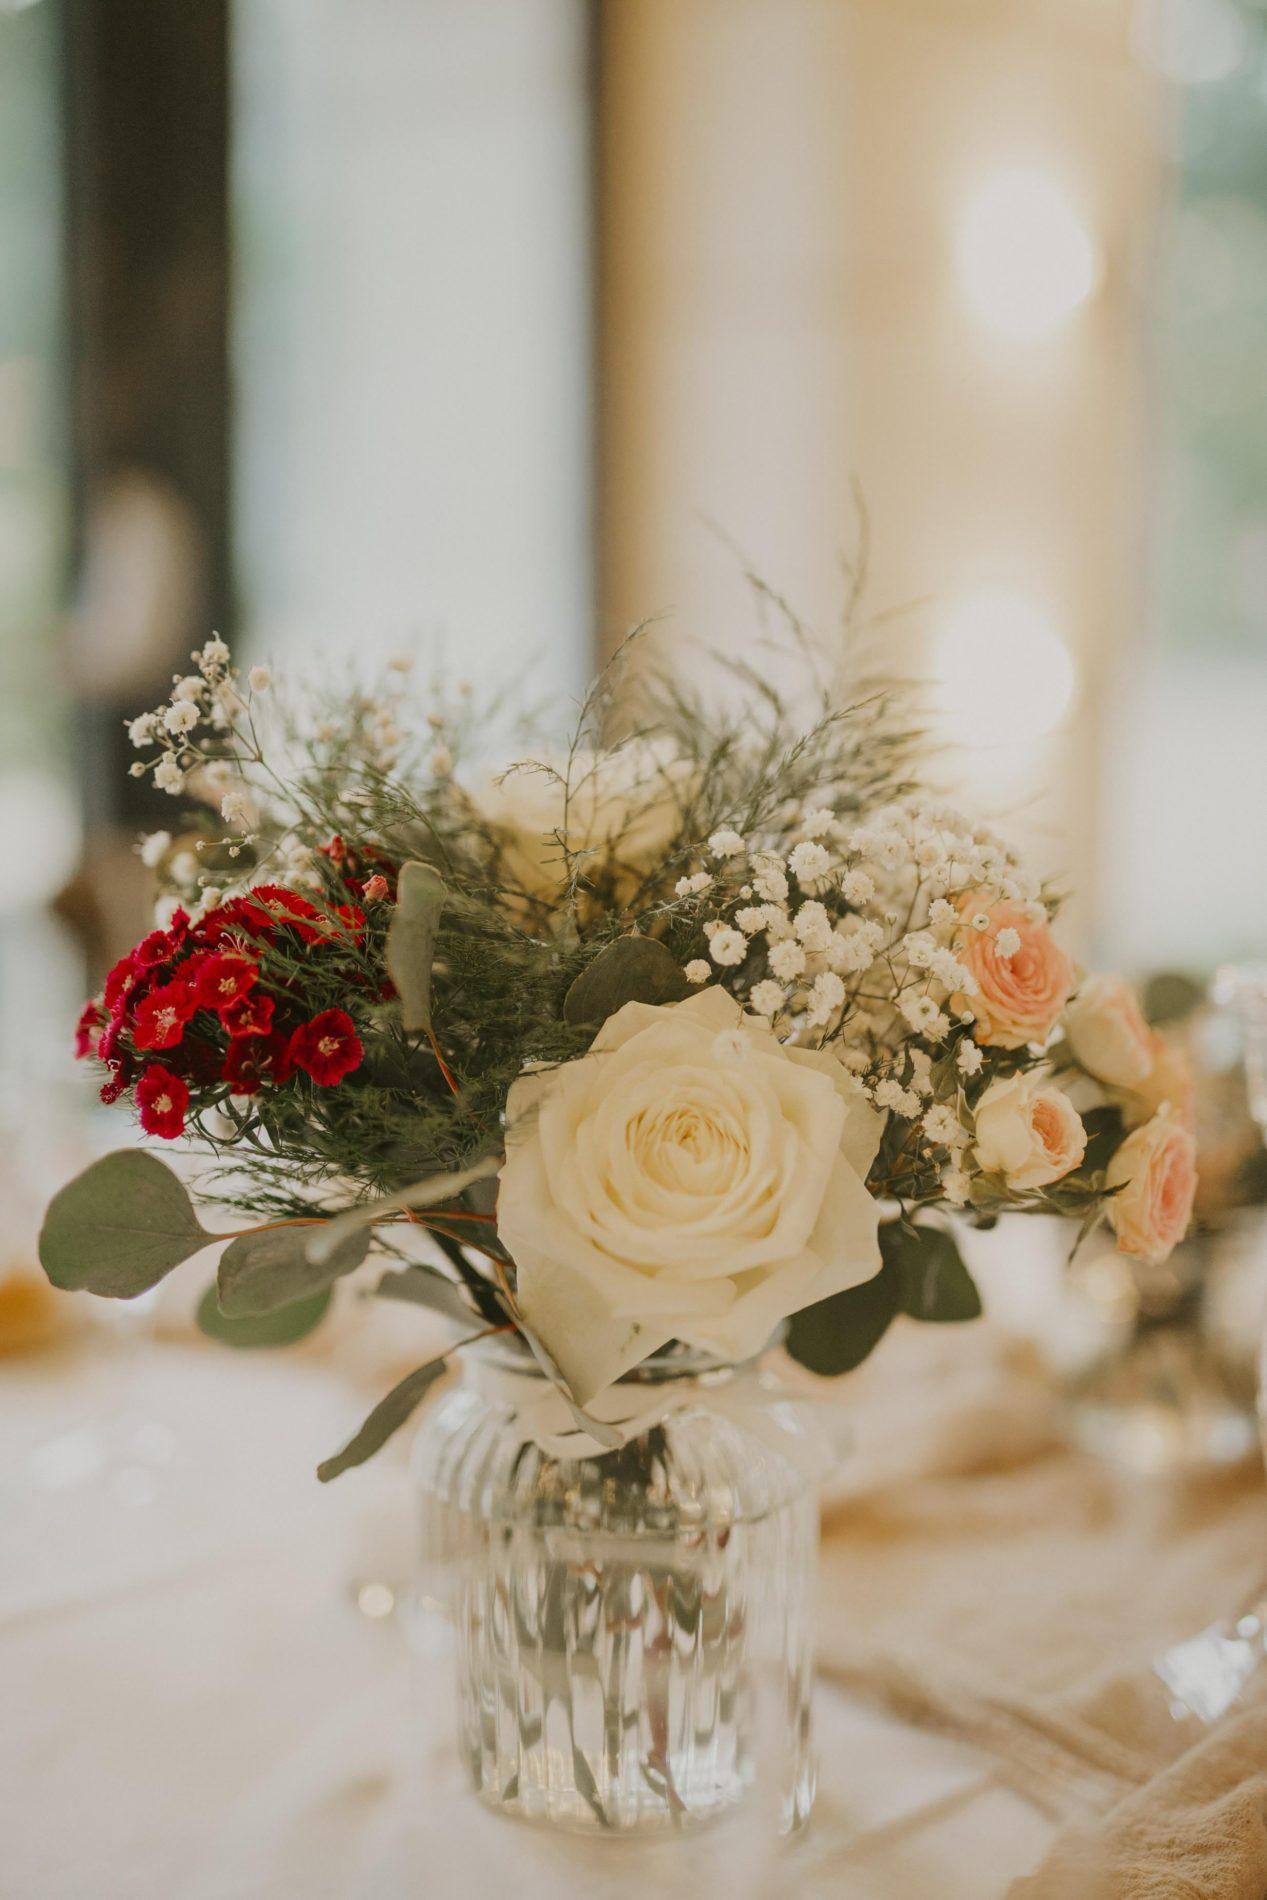 0148_04-CelineSereivuth-150-obonheurdesdames-decoration-mariage-location-Jordane-Chaillou